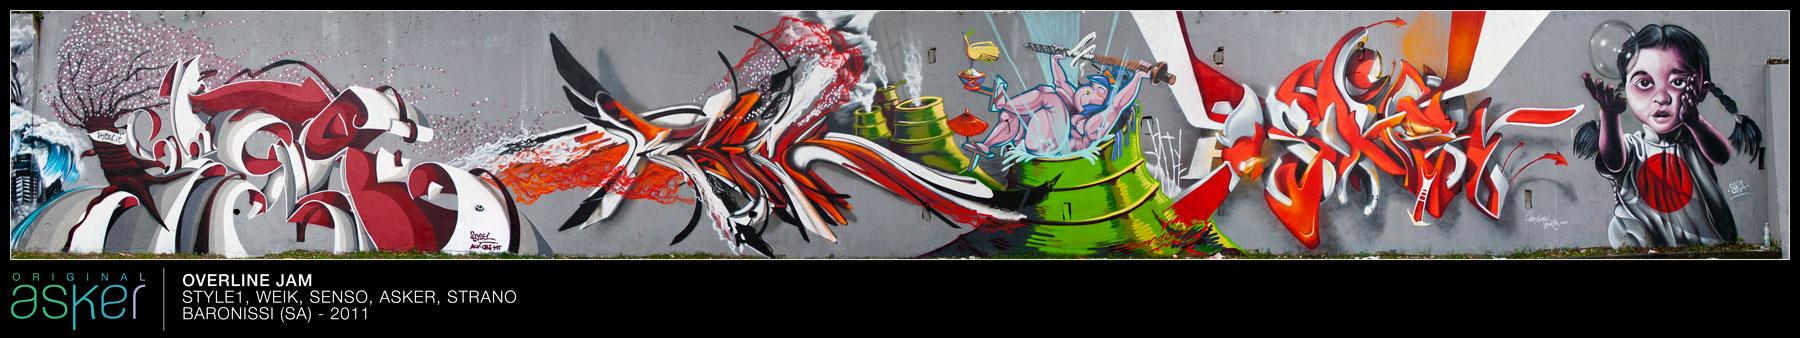 overline 2011 the wall by originalASKER